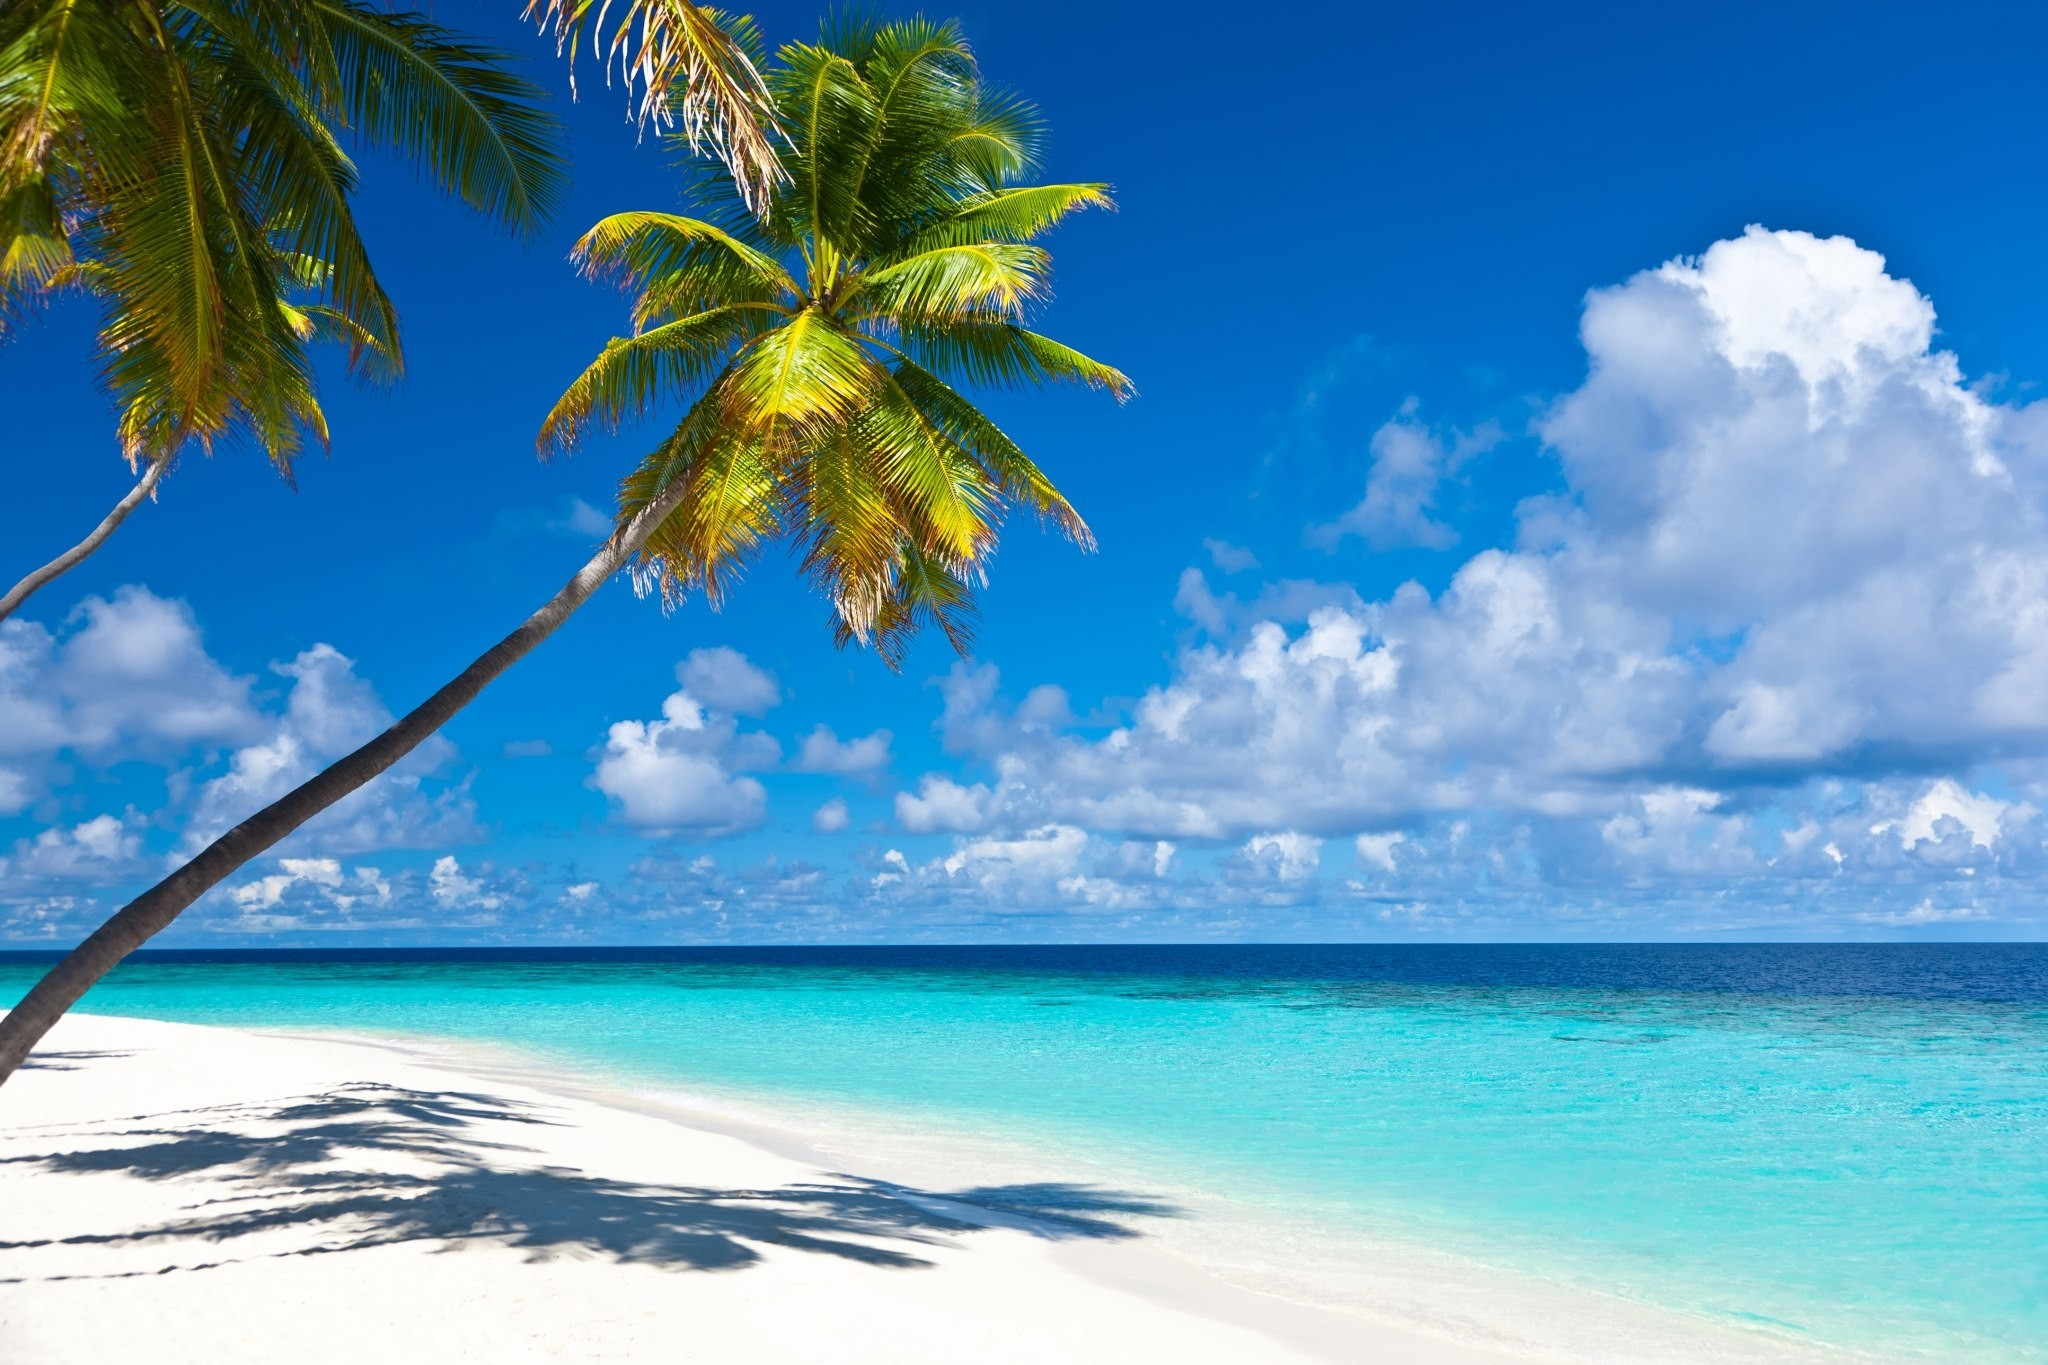 Caribbean beach pictures wallpaper 70 images - Caribbean wallpaper free ...